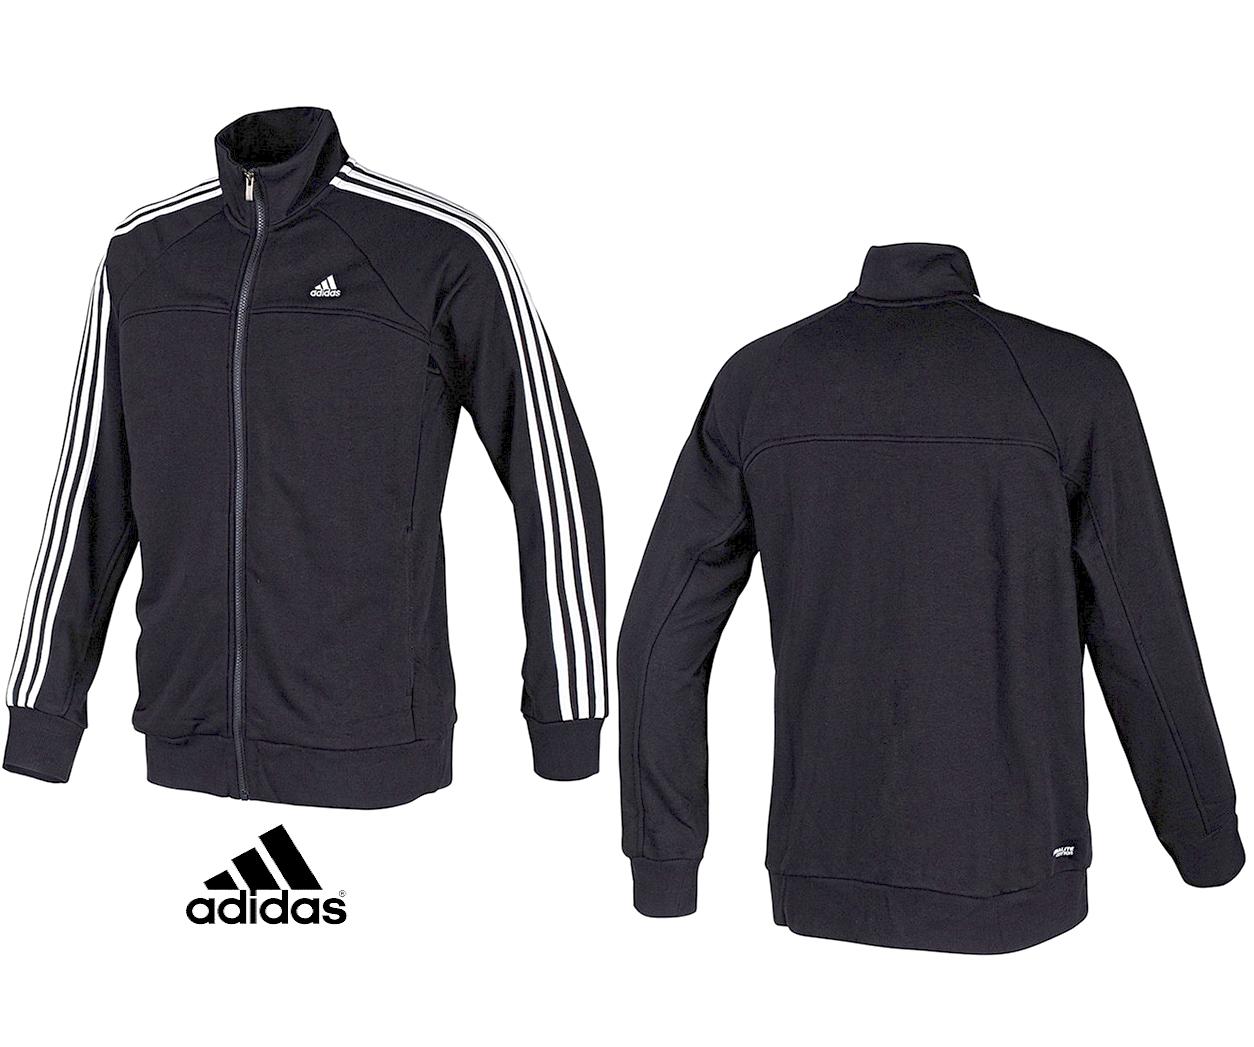 Кофта Adidas Perfomance ClimaLite Cotton black